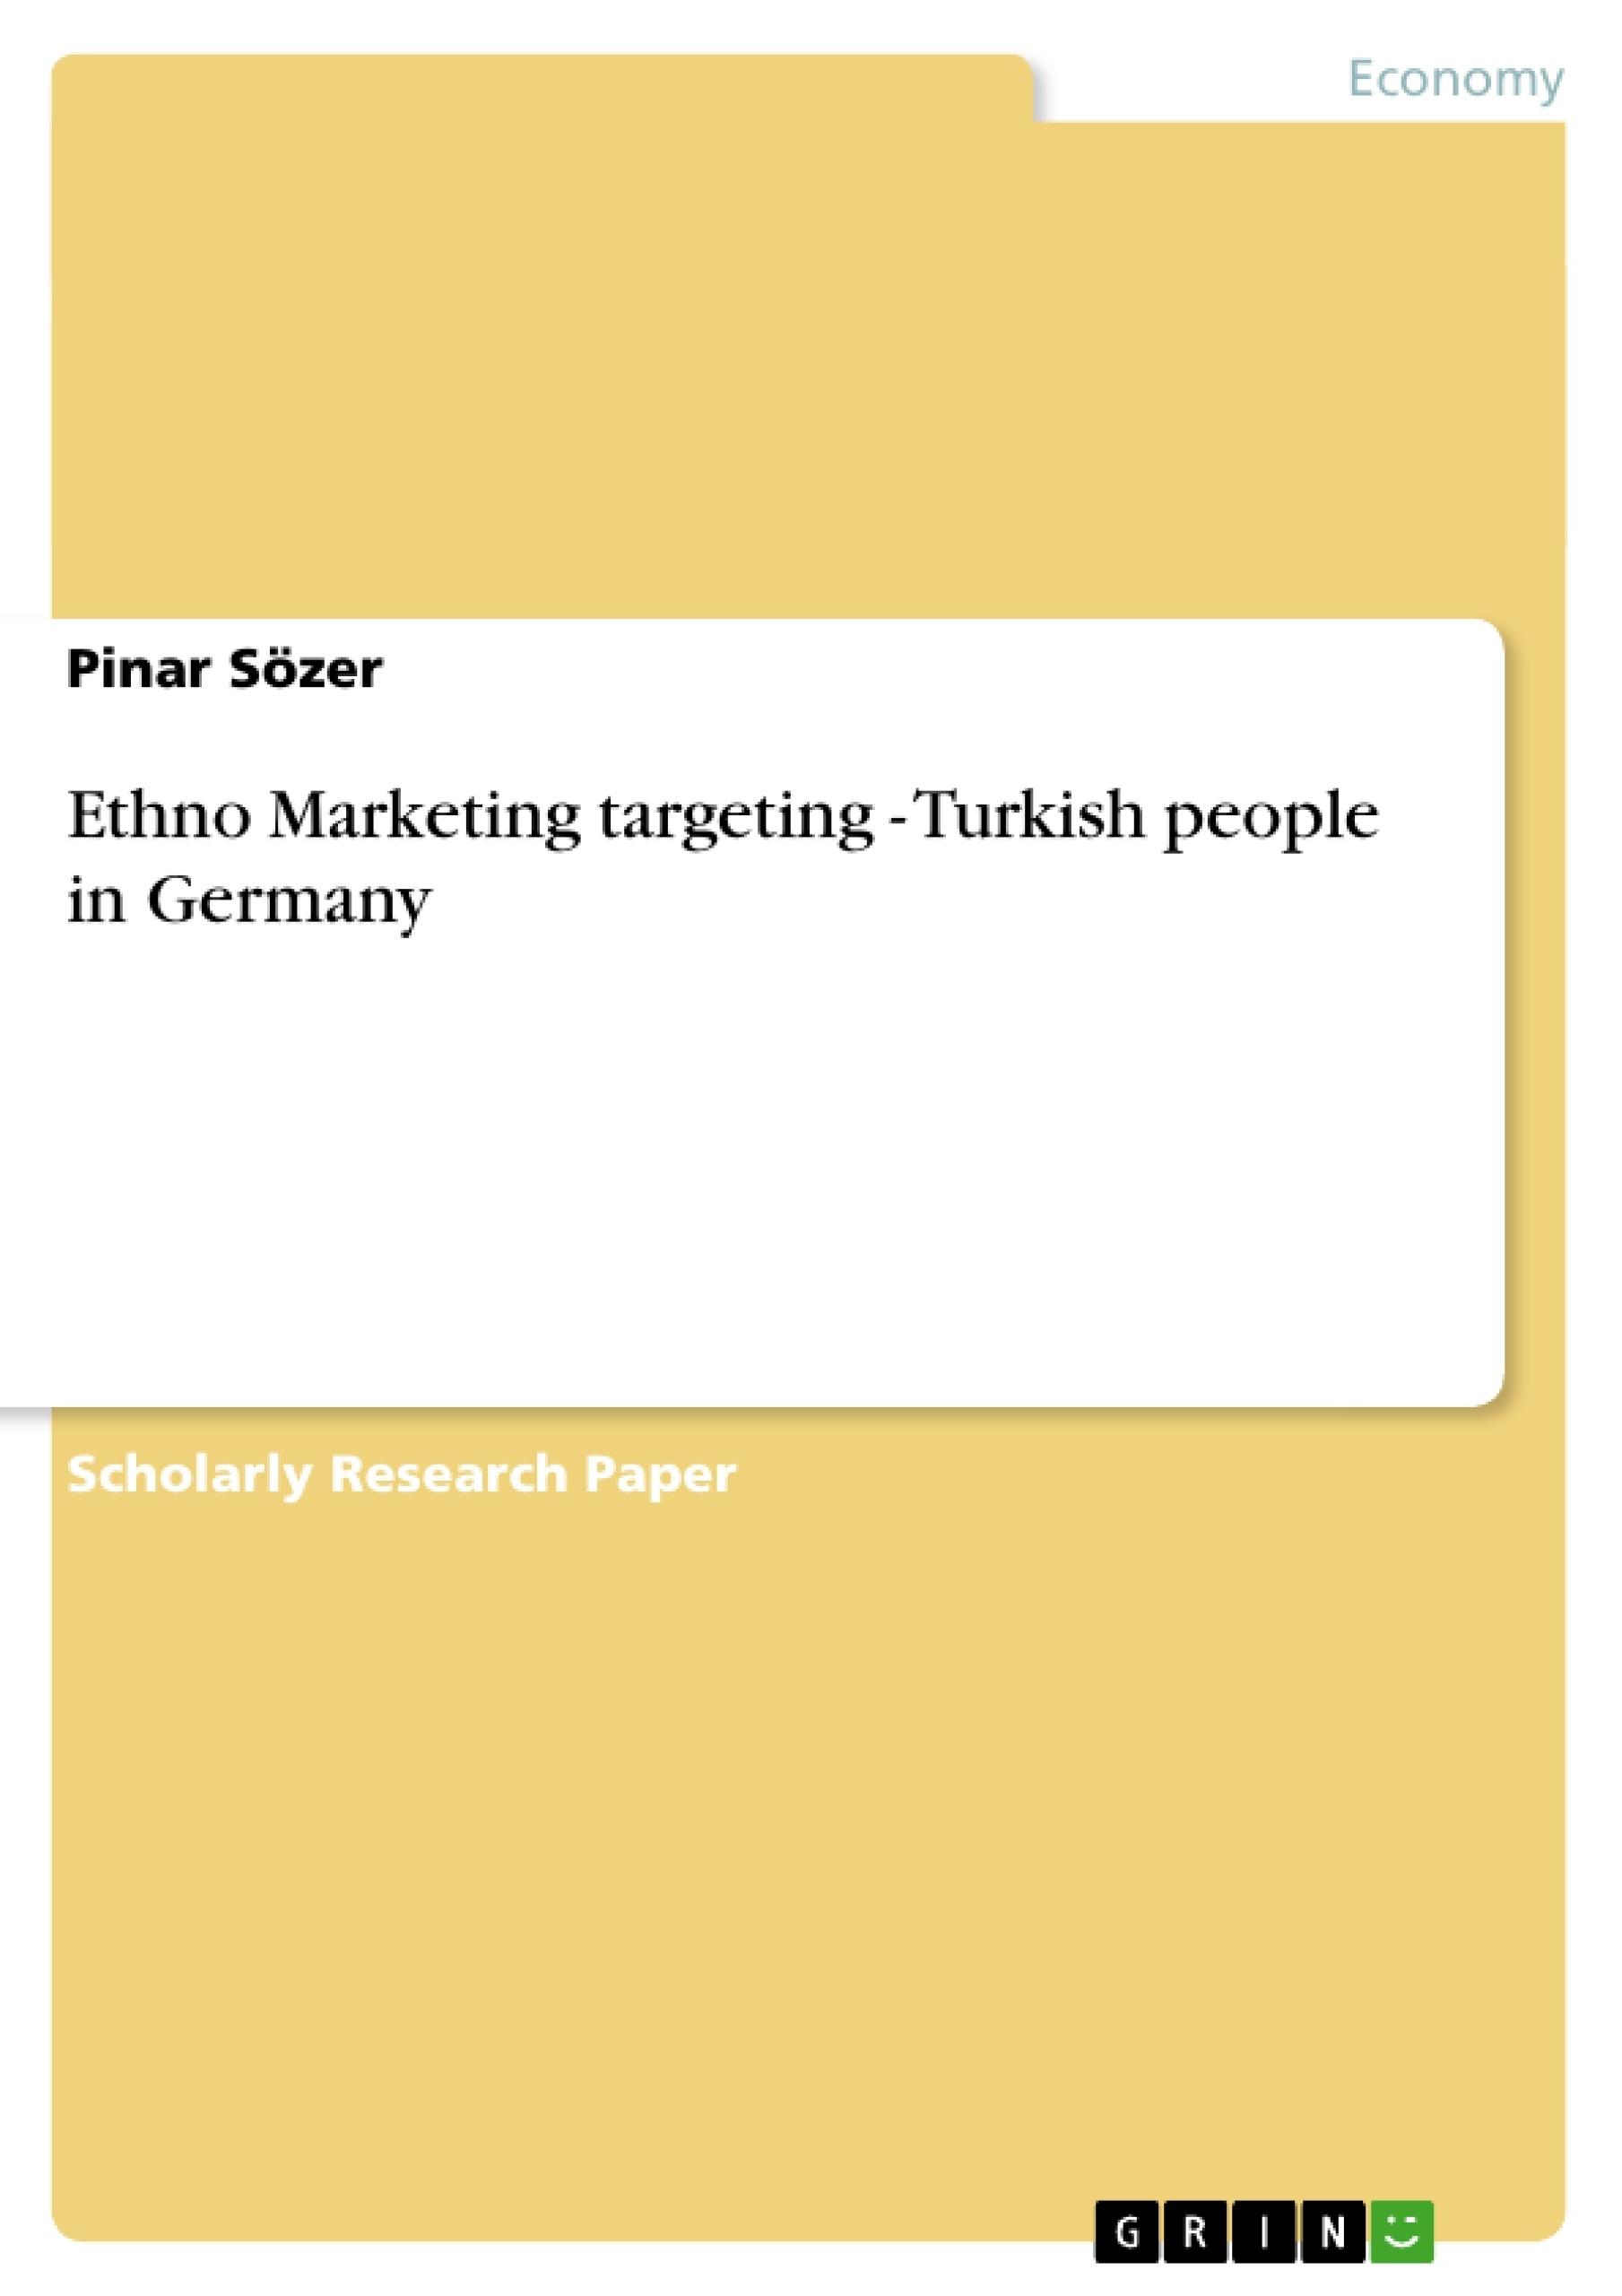 Title: Ethno Marketing targeting  -  Turkish people in Germany